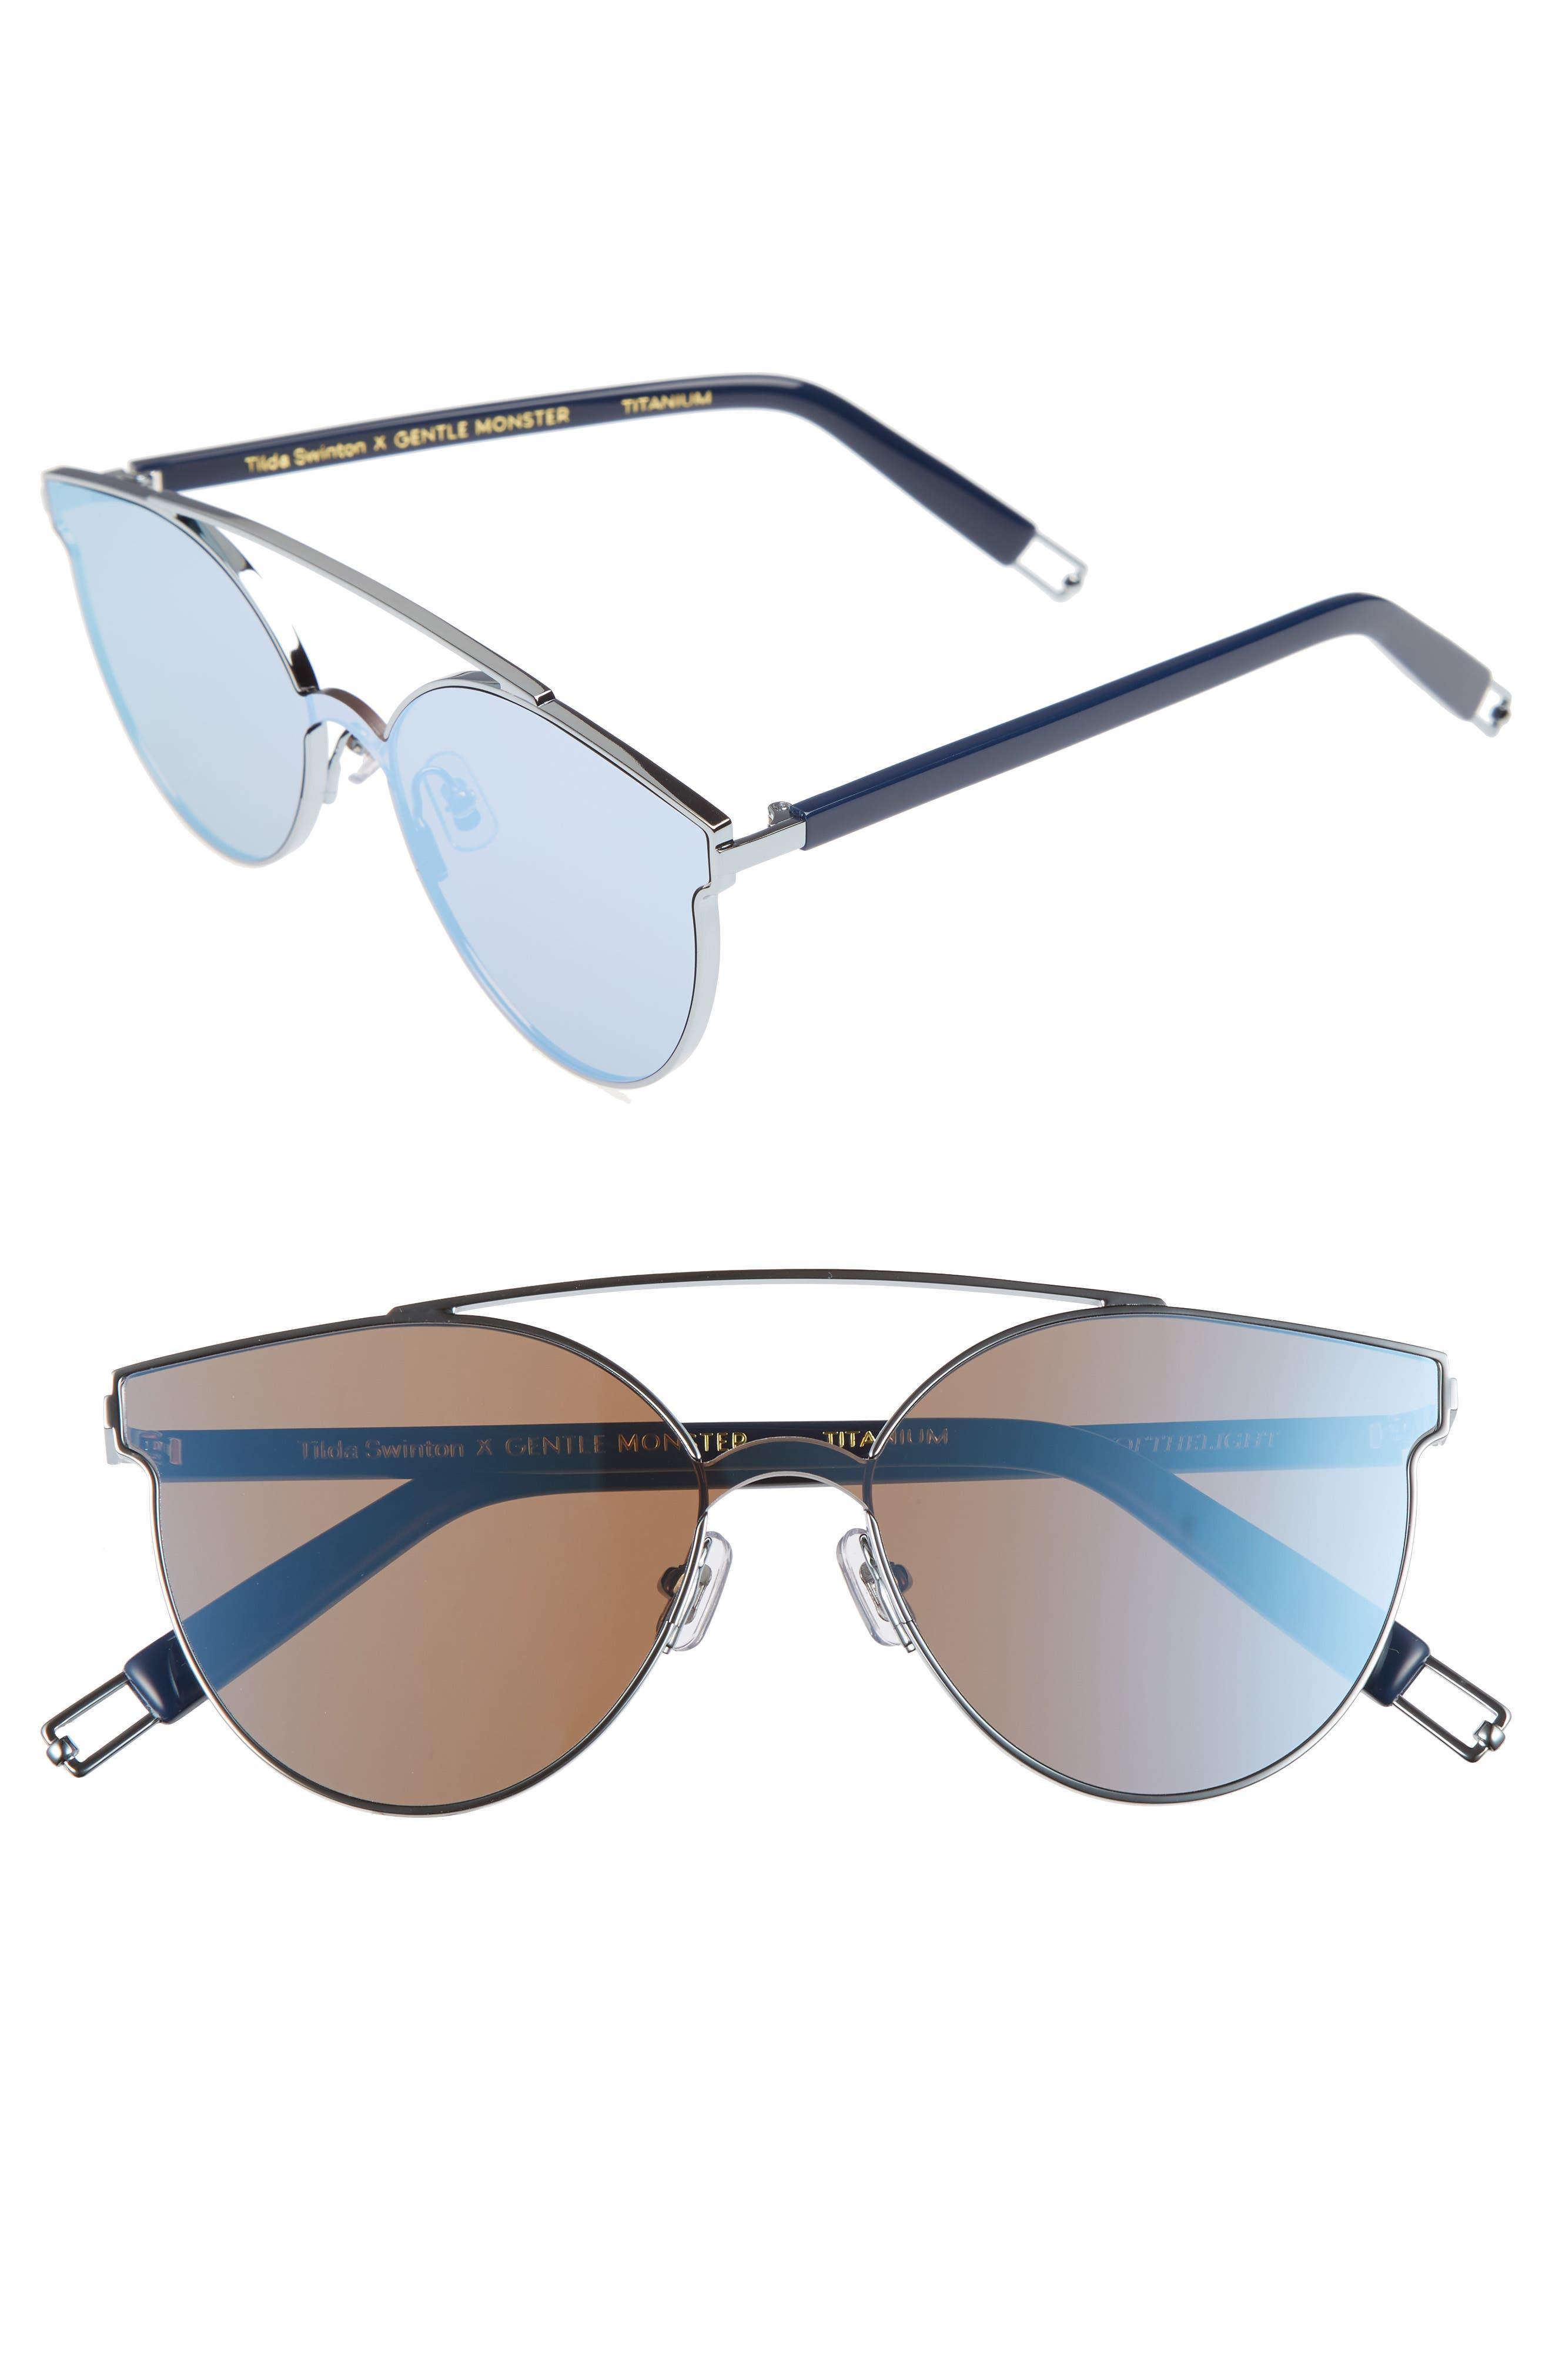 Main Image - Tilda Swinton x Gentle Monster Trick of the Light 60mm Shield Sunglasses